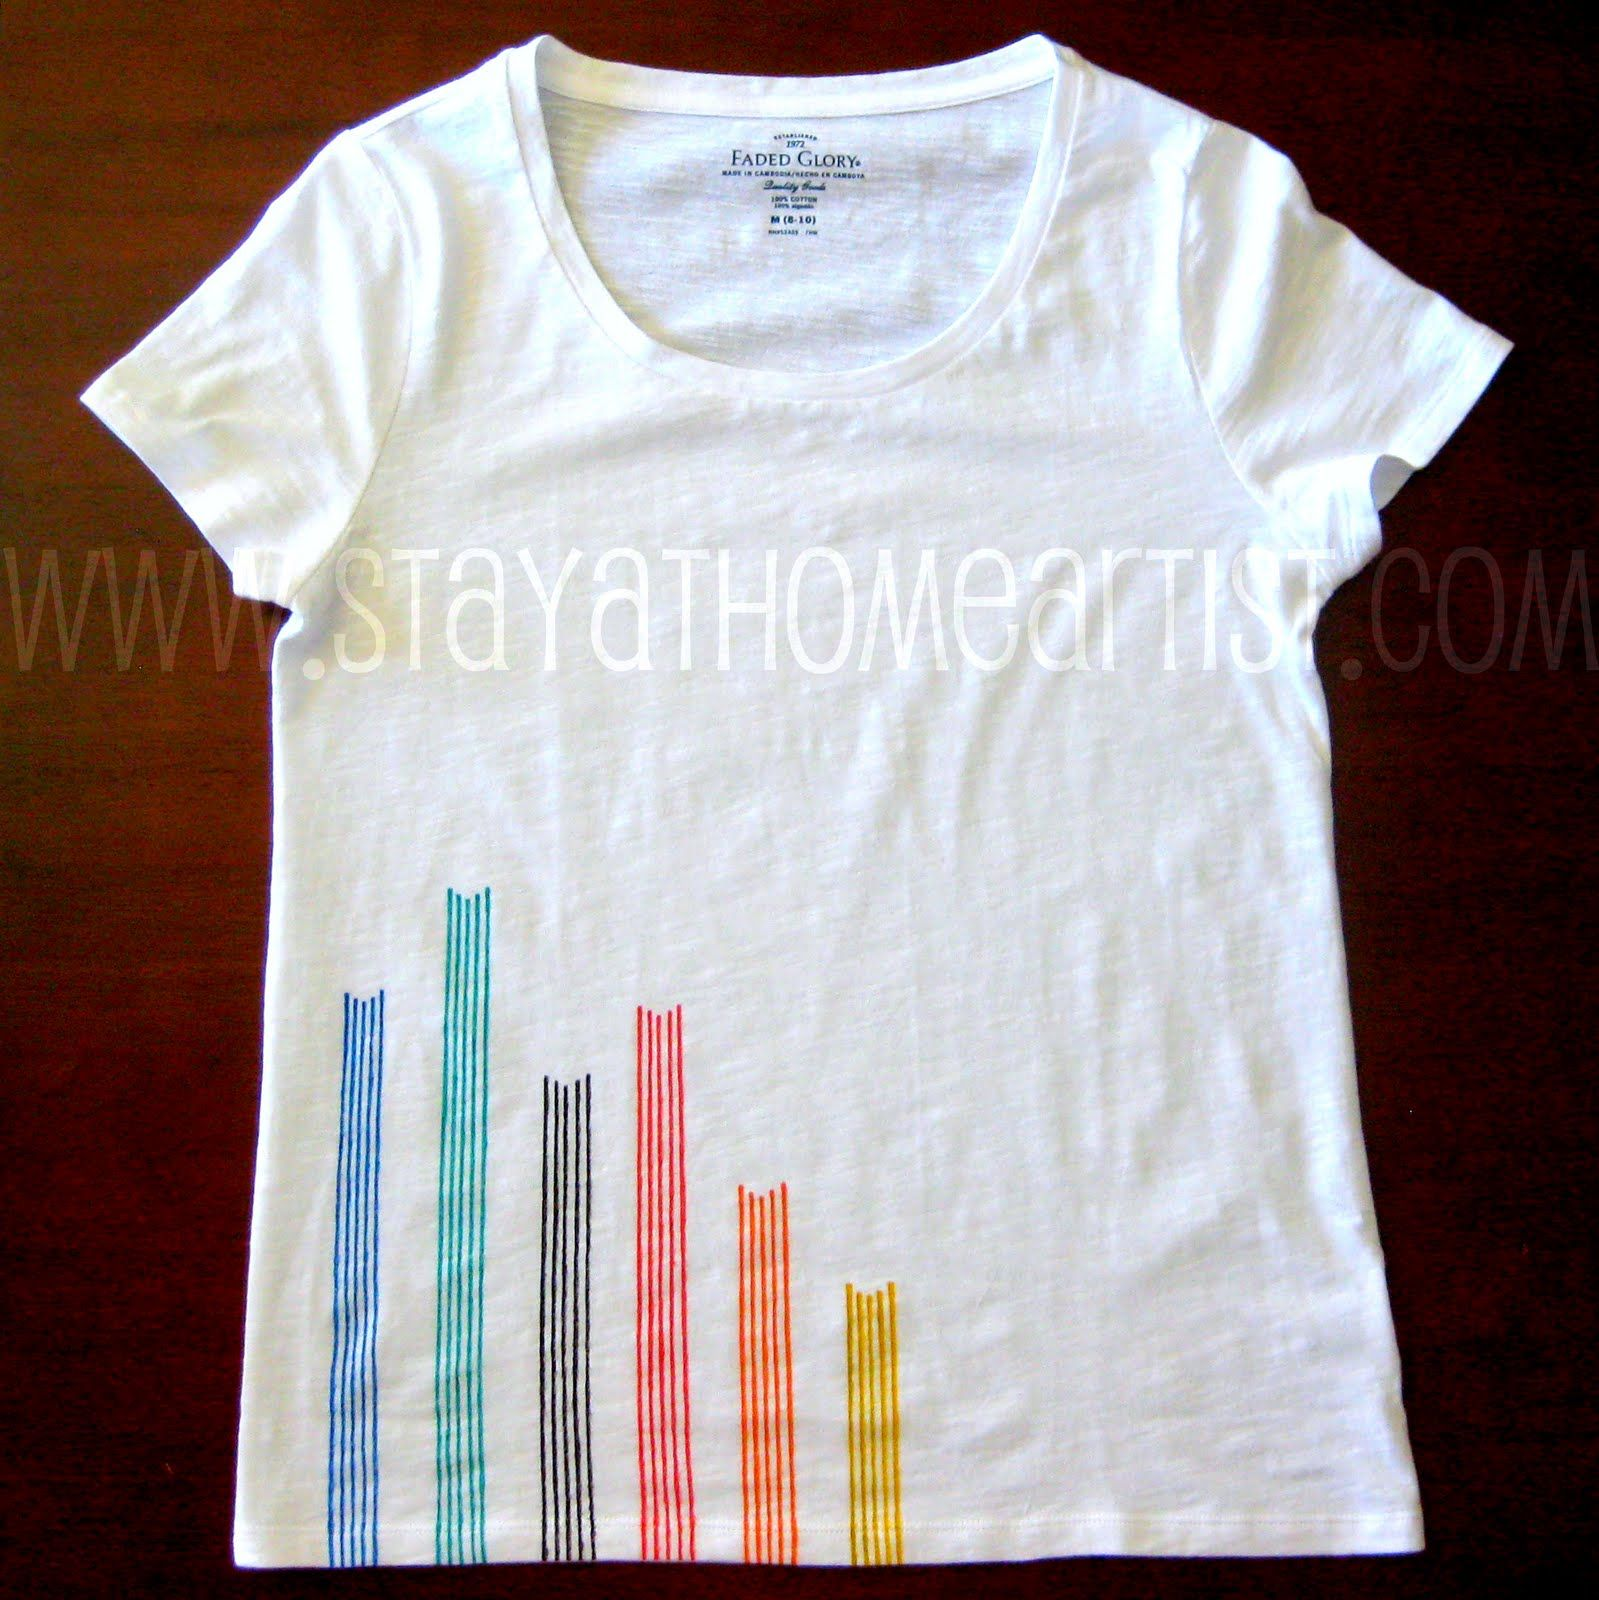 Image result for car image for shirt